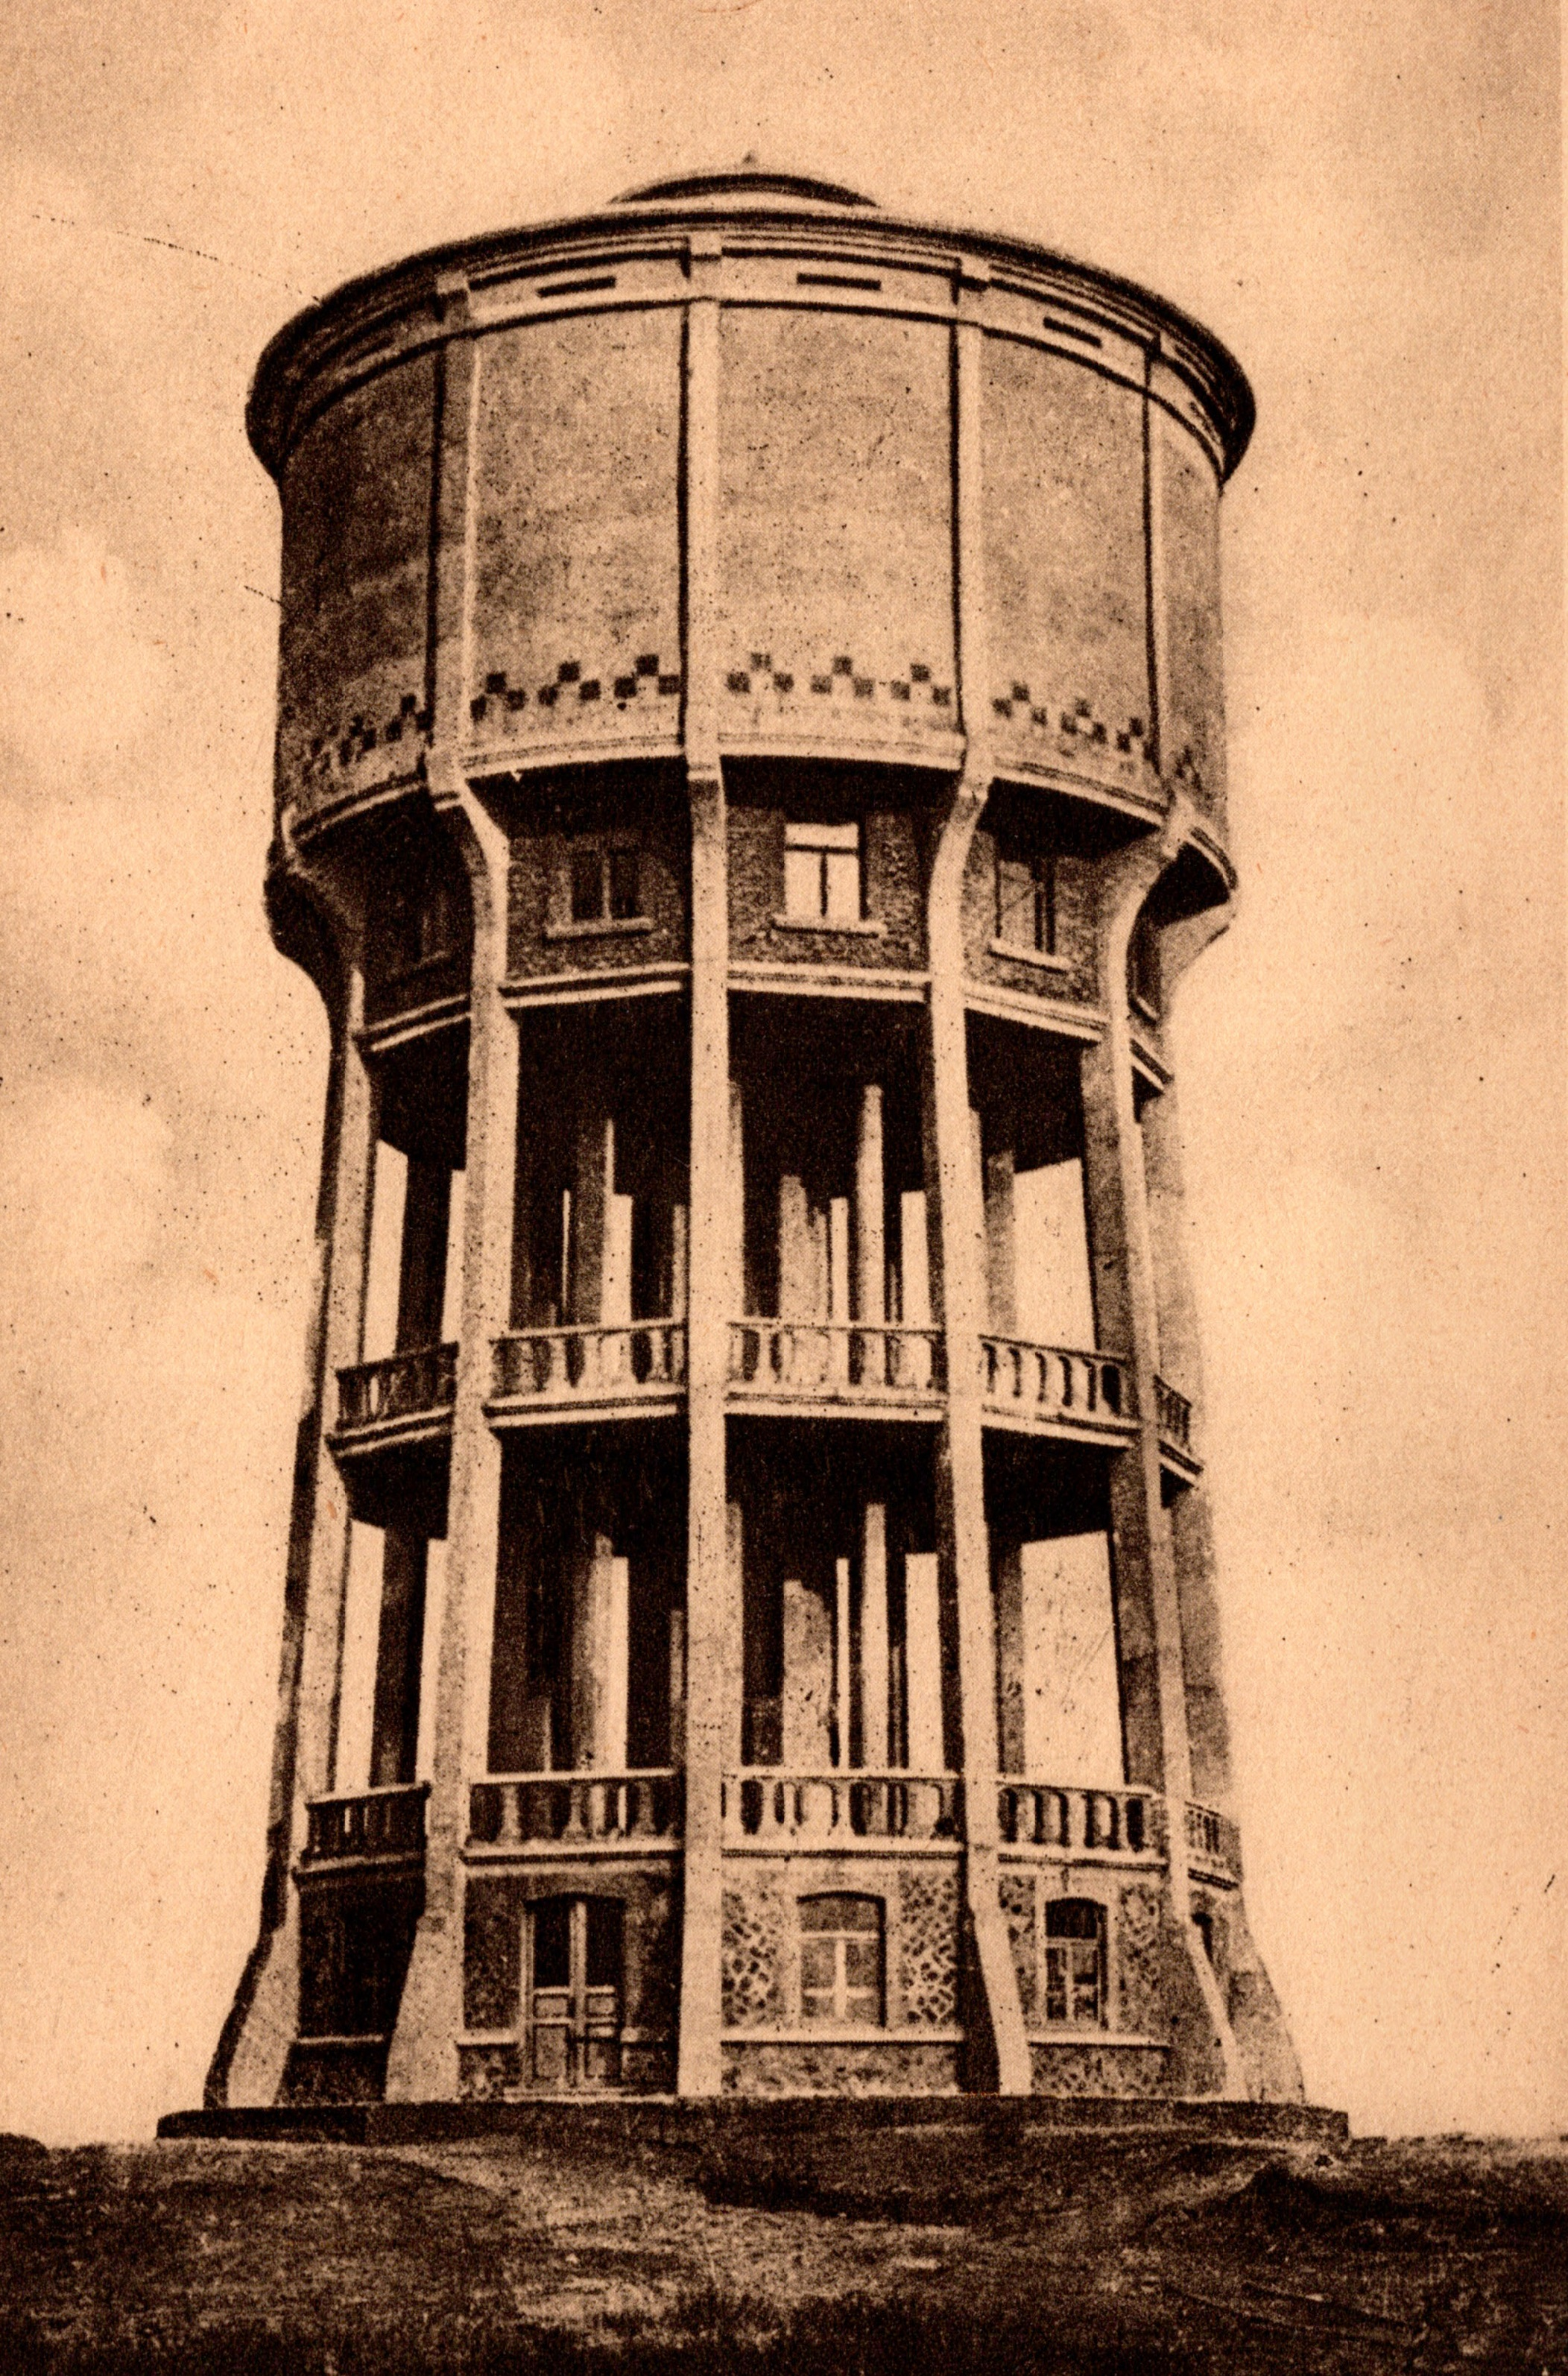 The Watertower of Camp Beverlo